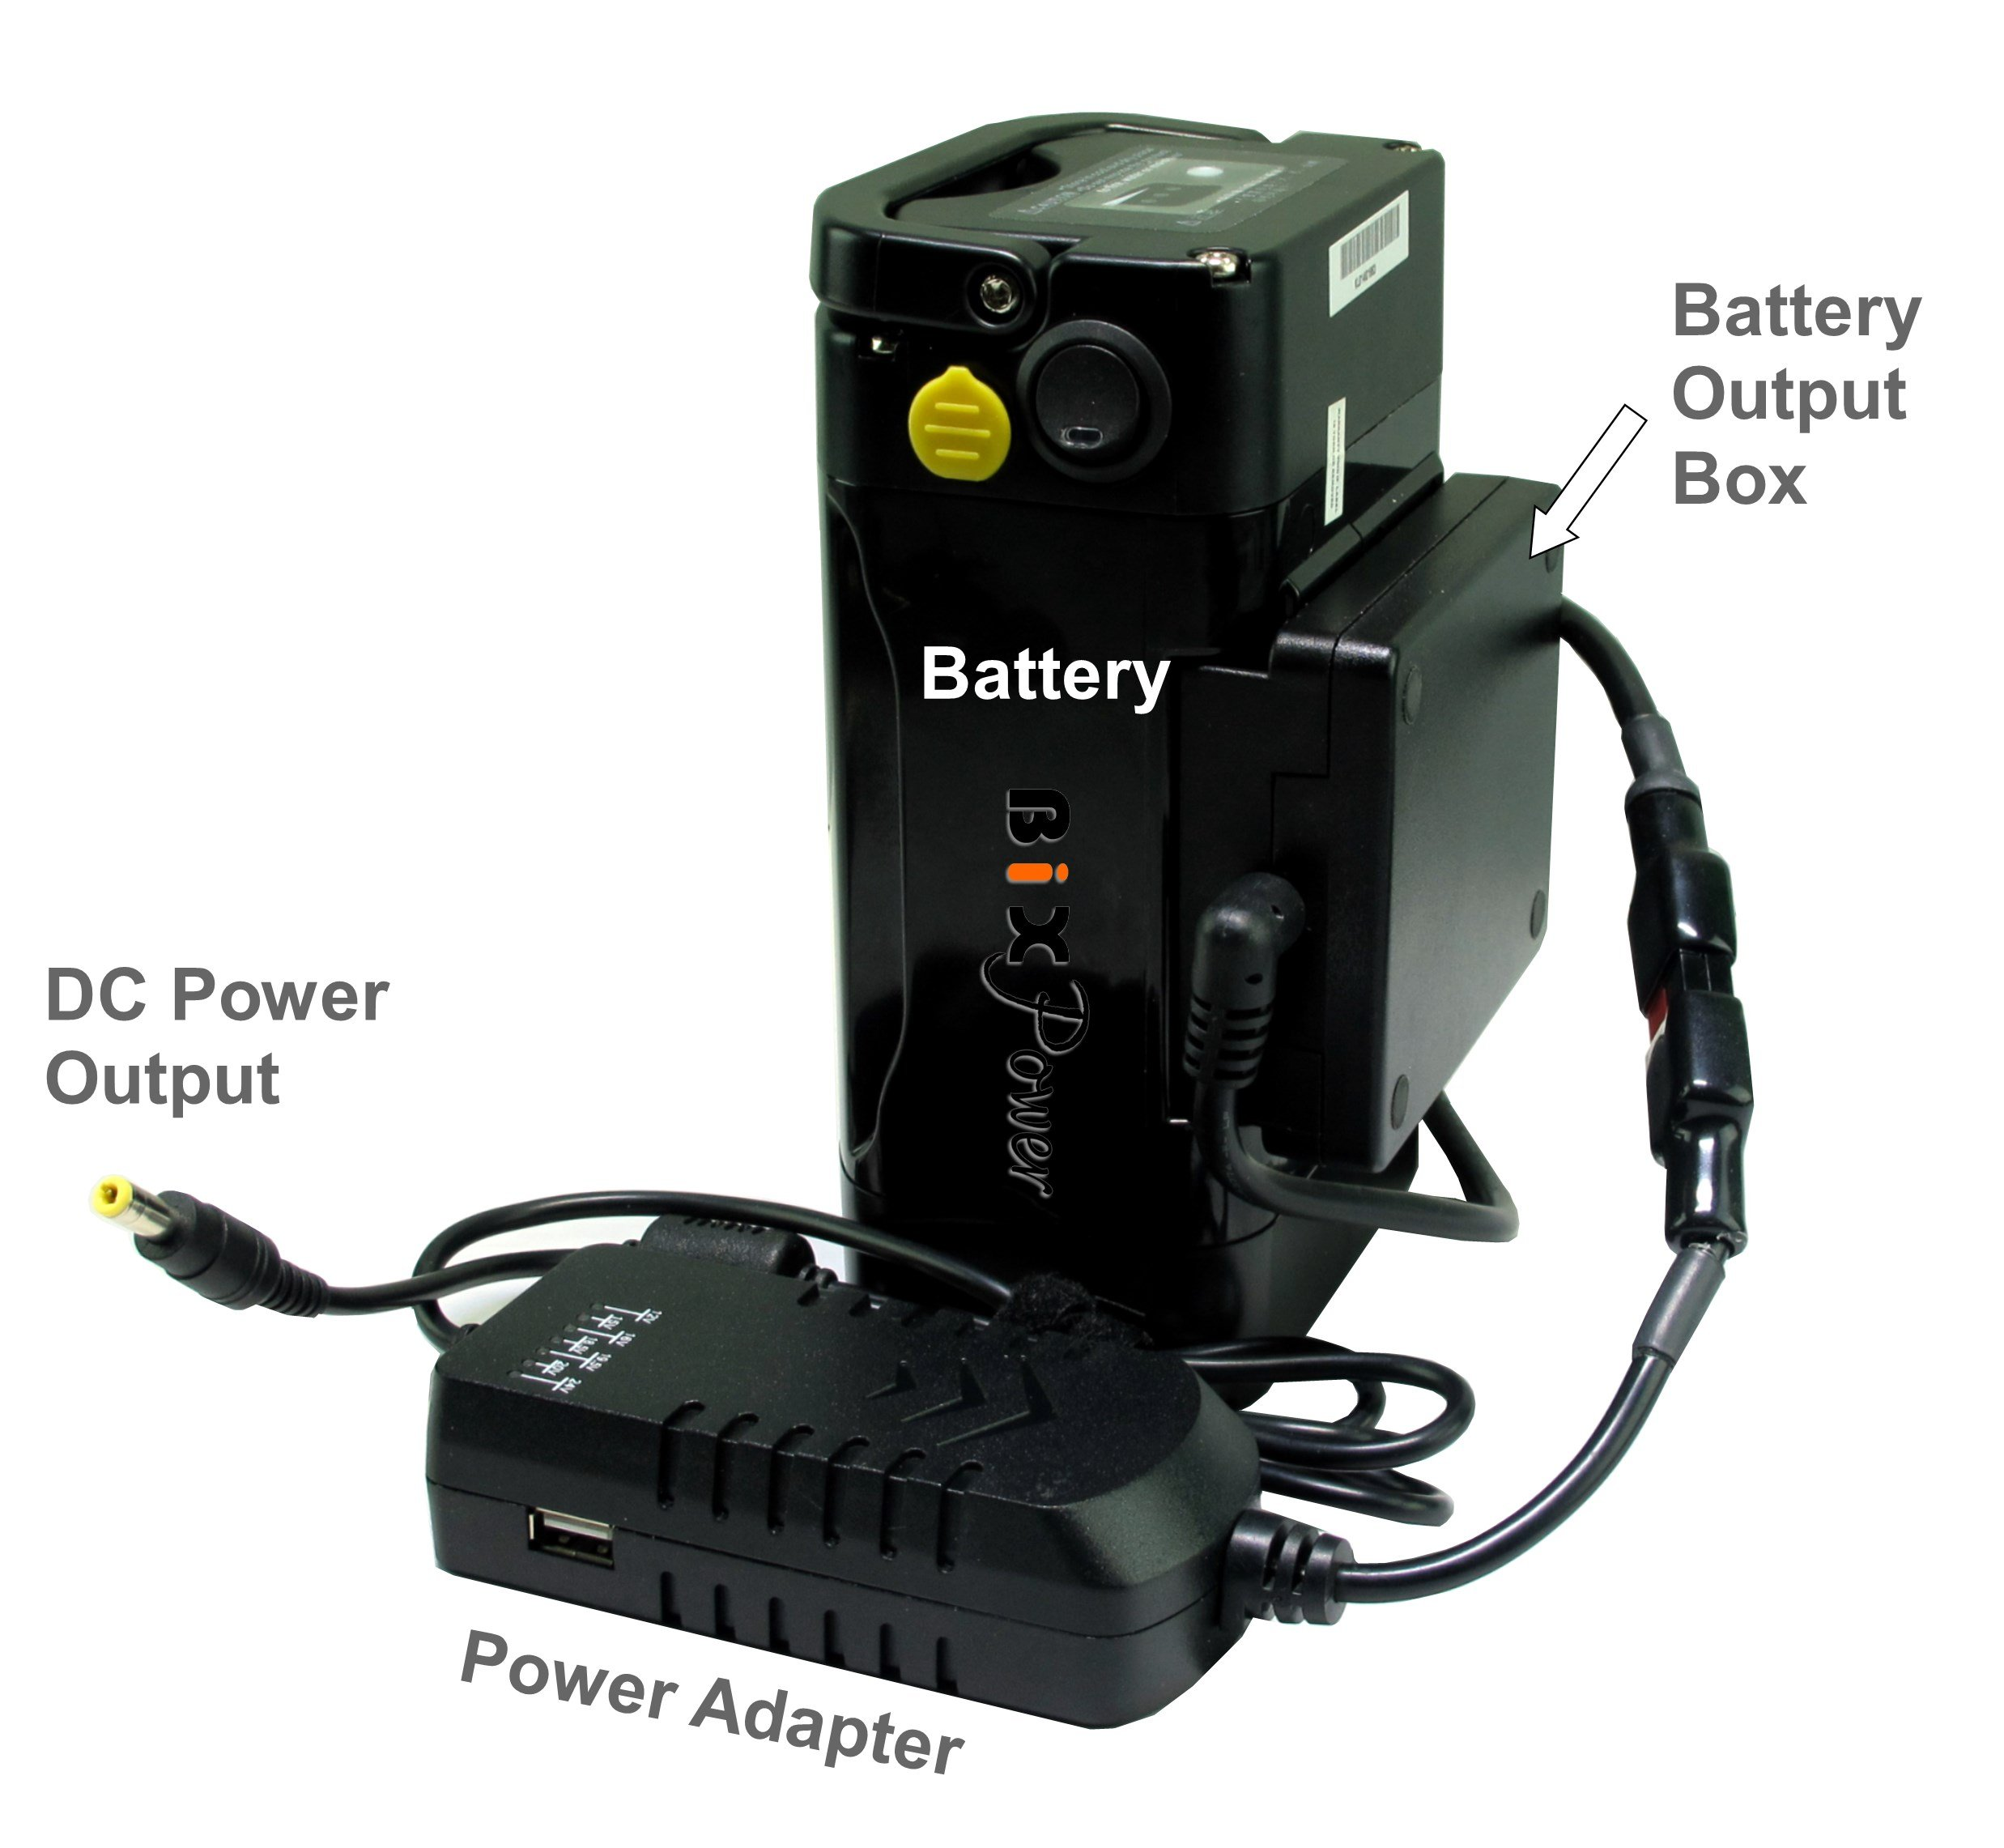 BiXPower MP330DC Battery Pack - Super Capacity 336 Watt-hour Light Weight Battery with Multi Output Voltages (12v/15v/16v/18v/19v/24v) Power Converter Combo Kit by BiXPower (Image #1)